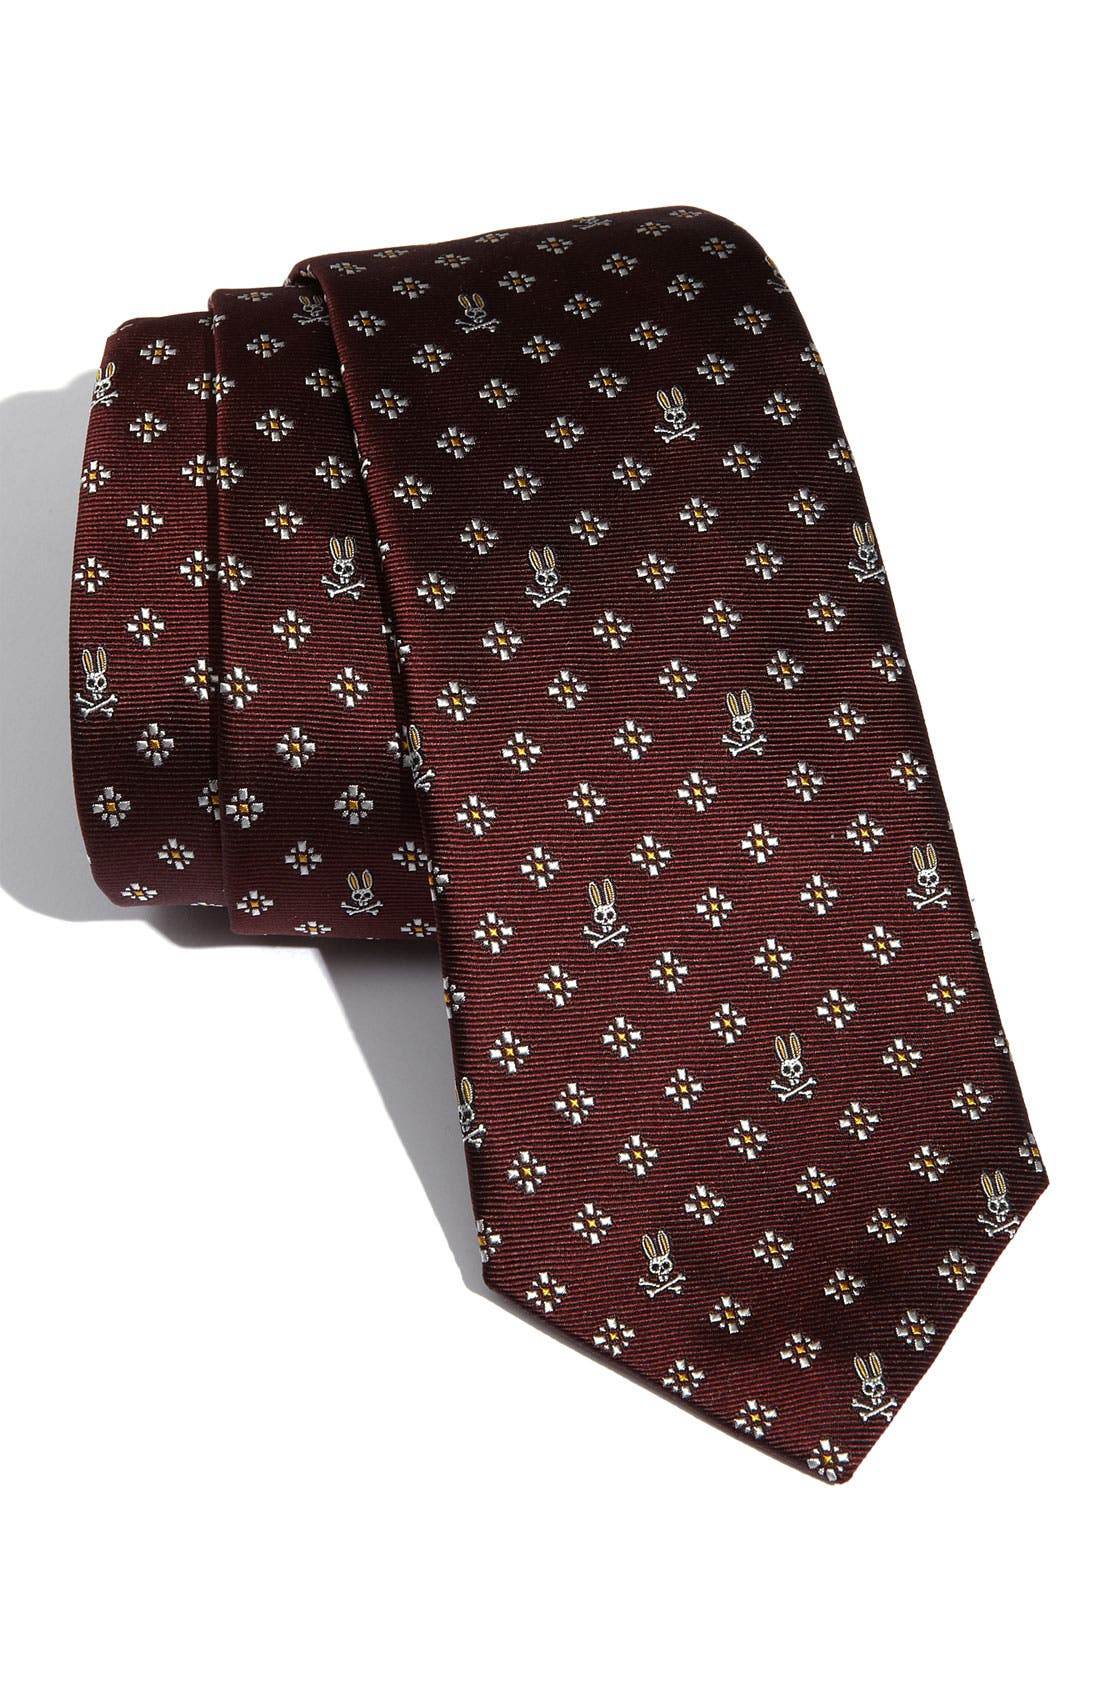 Main Image - Psycho Bunny 'Macclesfield' Woven Silk Tie